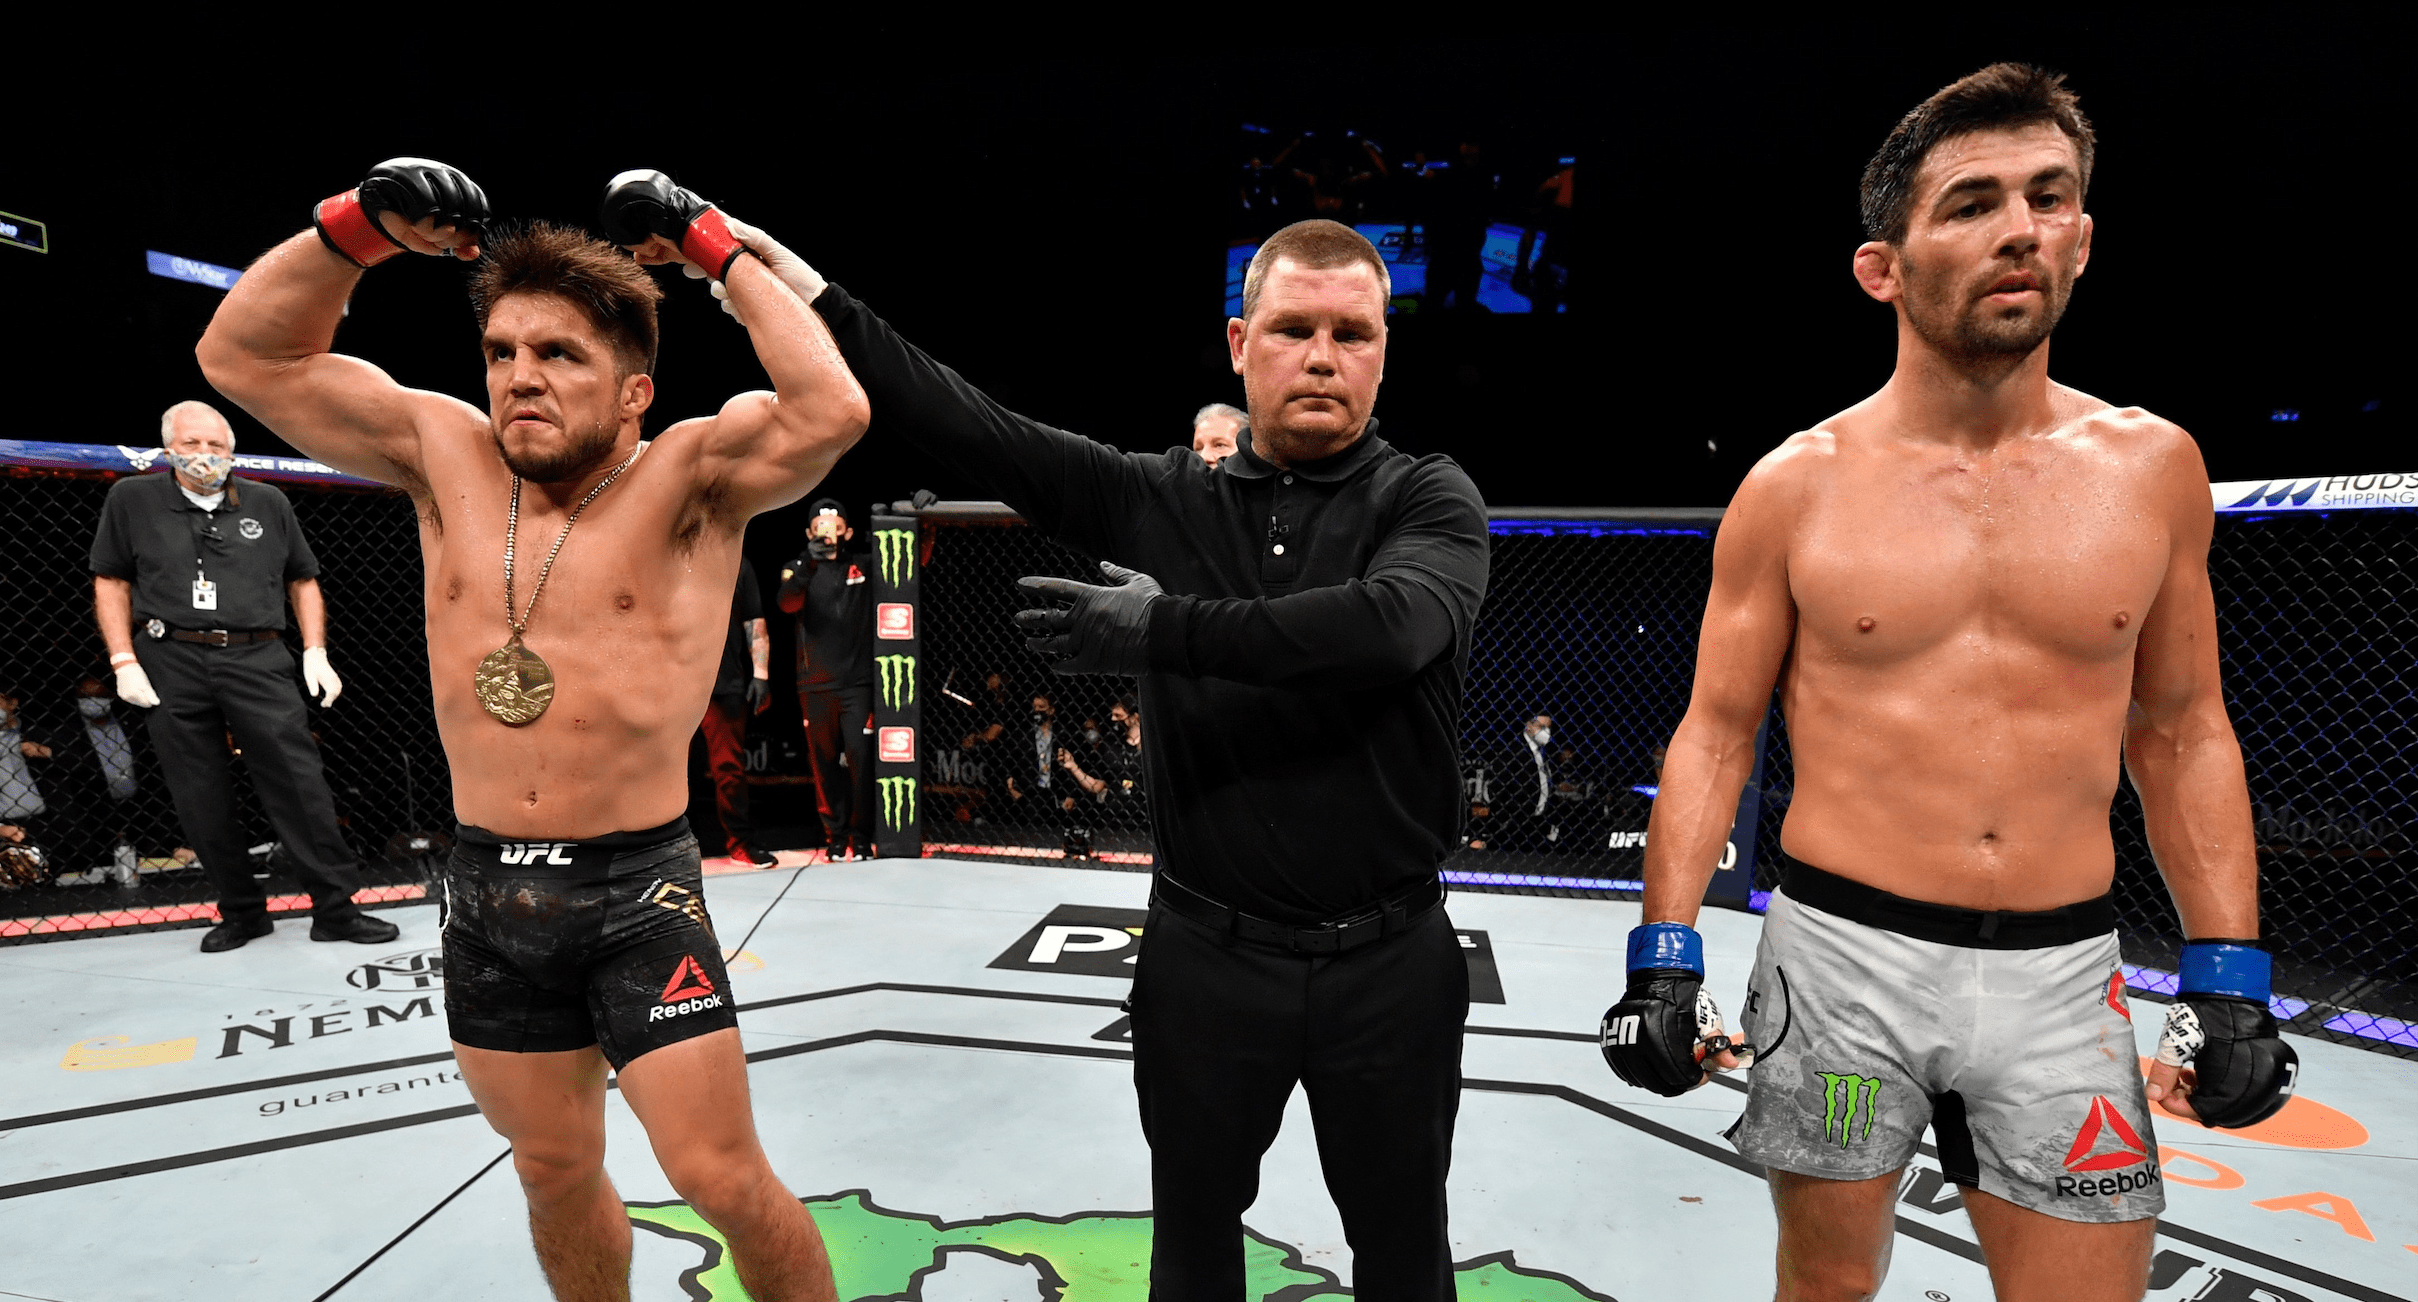 UFC: Dominick Cruz Still Blames Keith Peterson For Henry Cejudo Loss